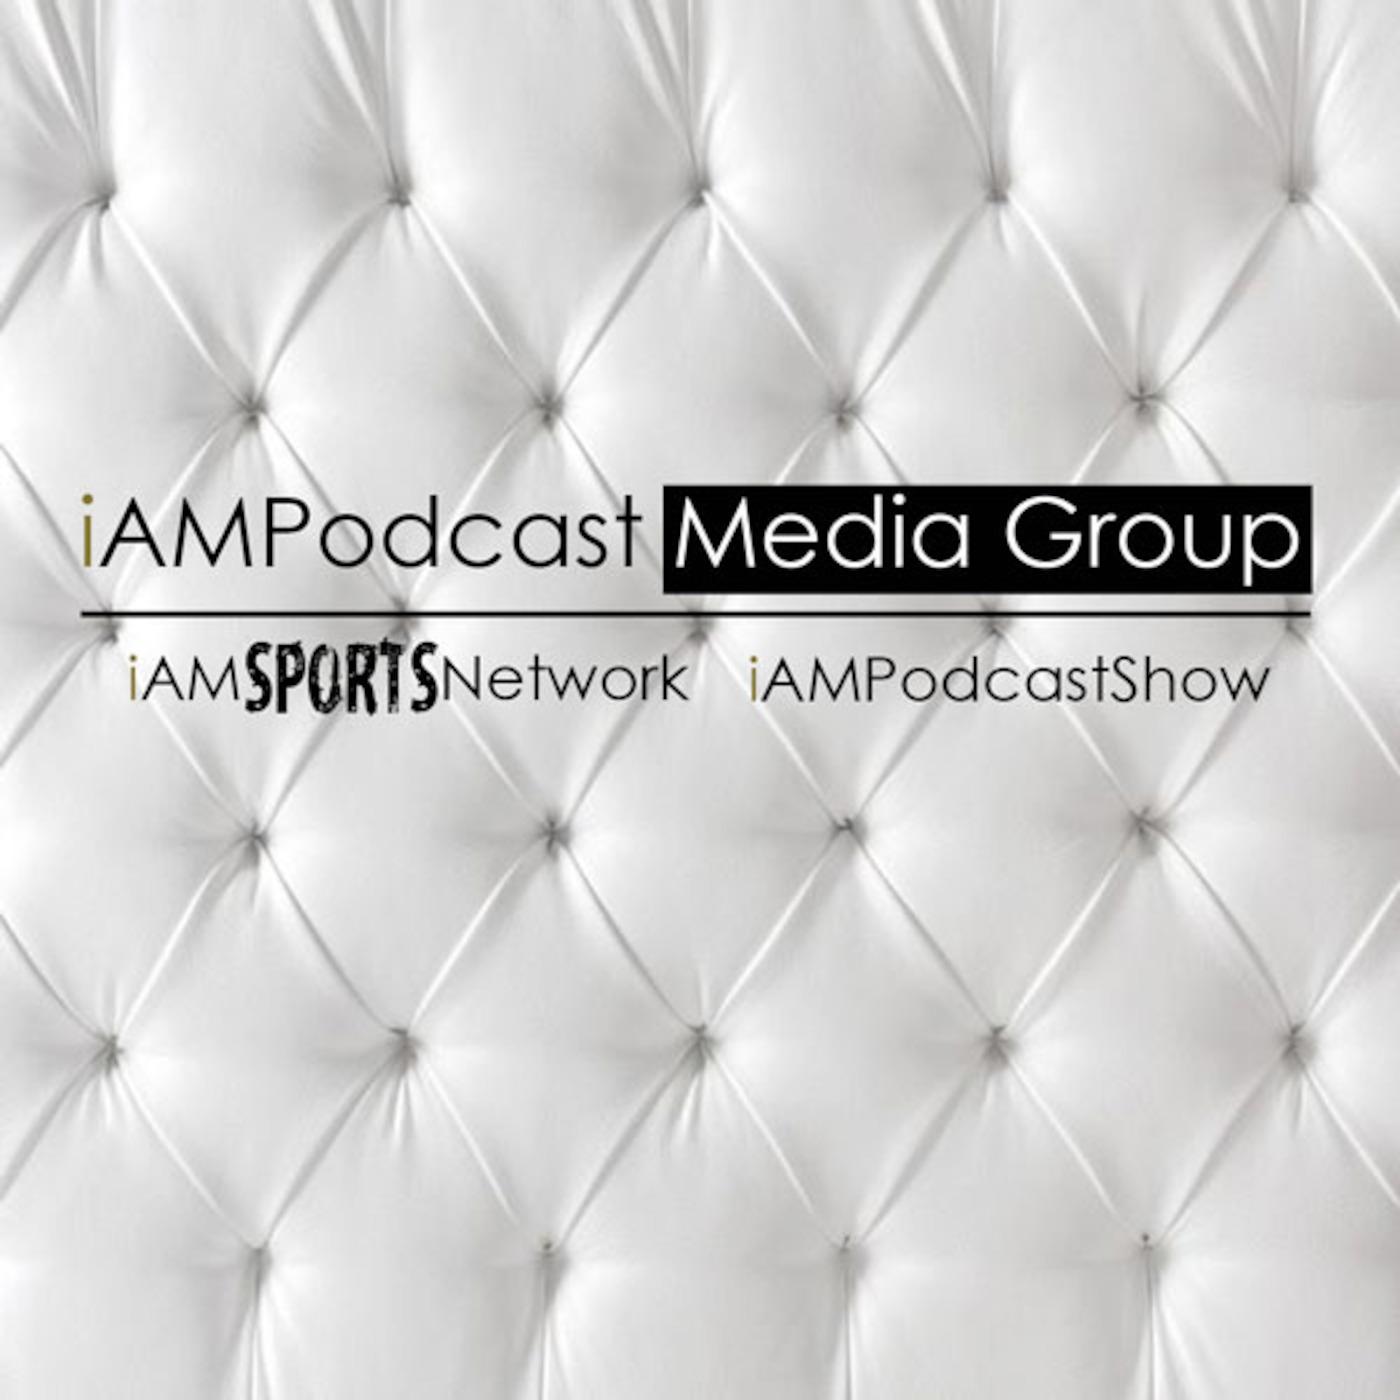 iAMPodcast